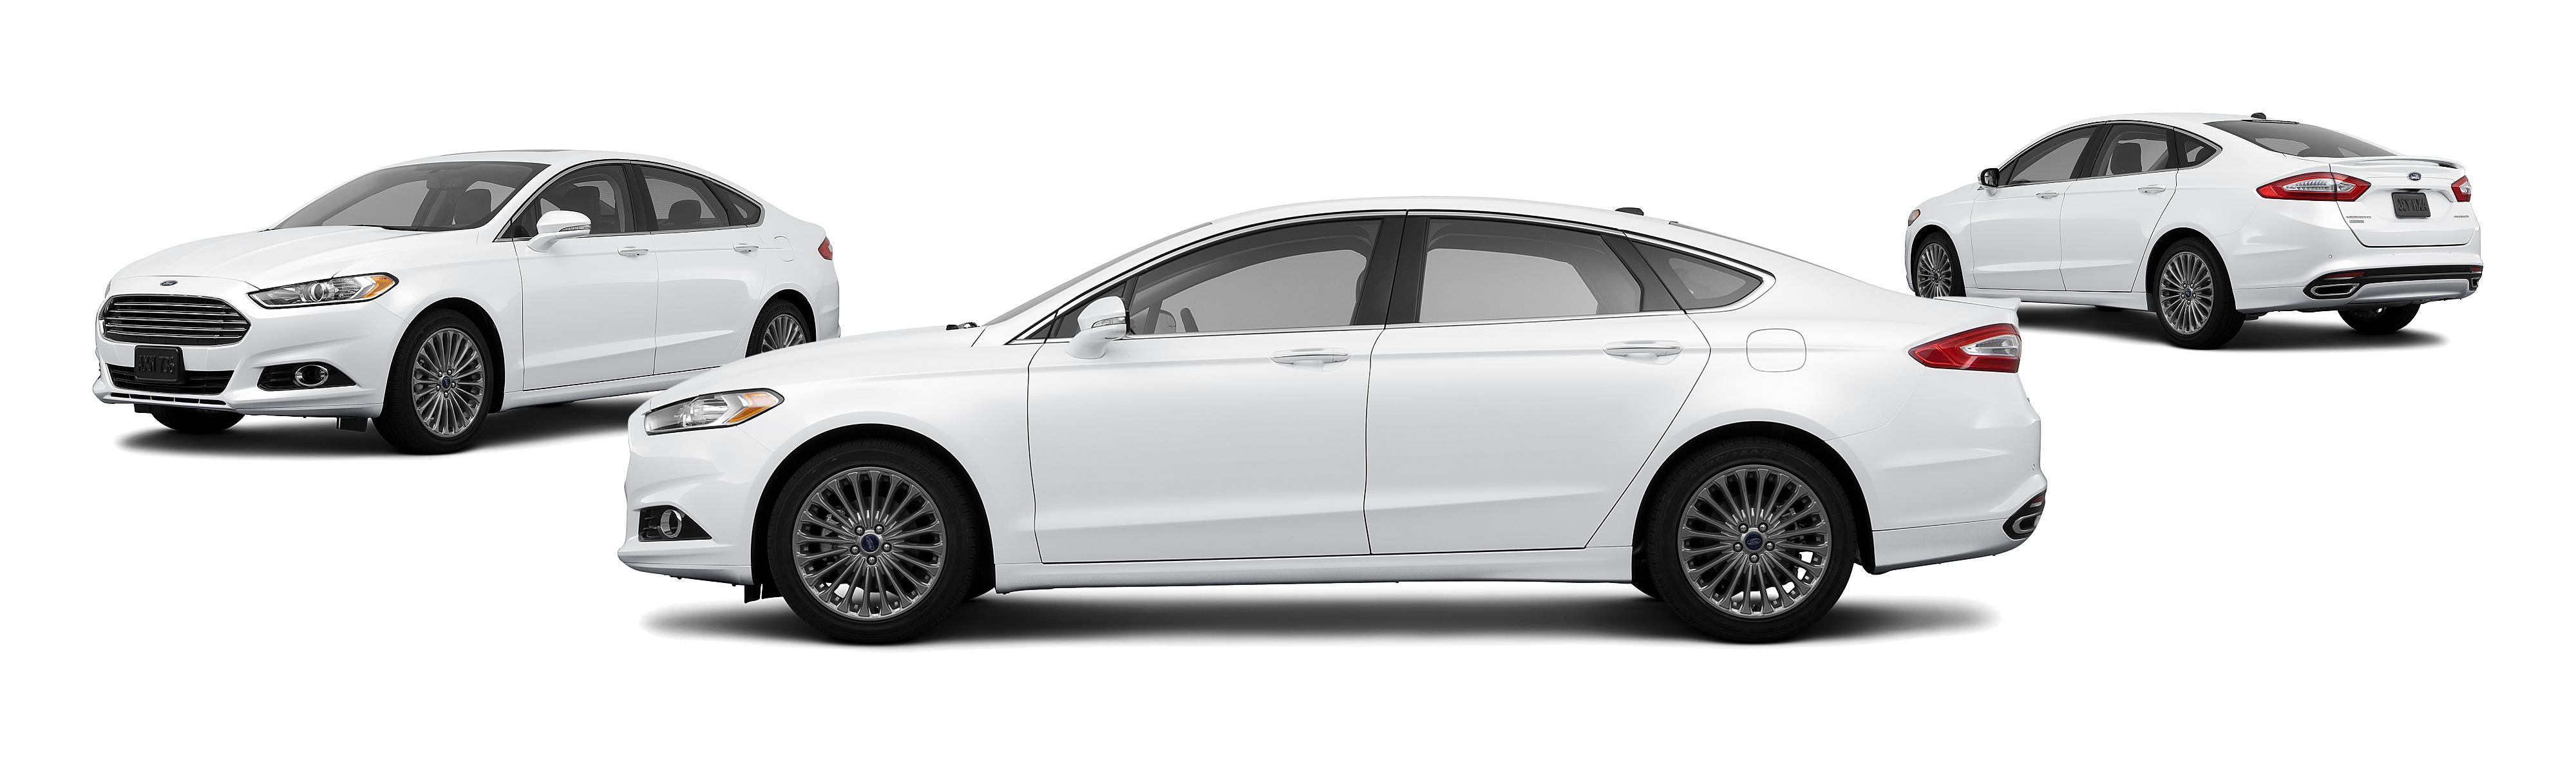 2013 Ford Fusion Titanium 4dr Sedan Research GrooveCar